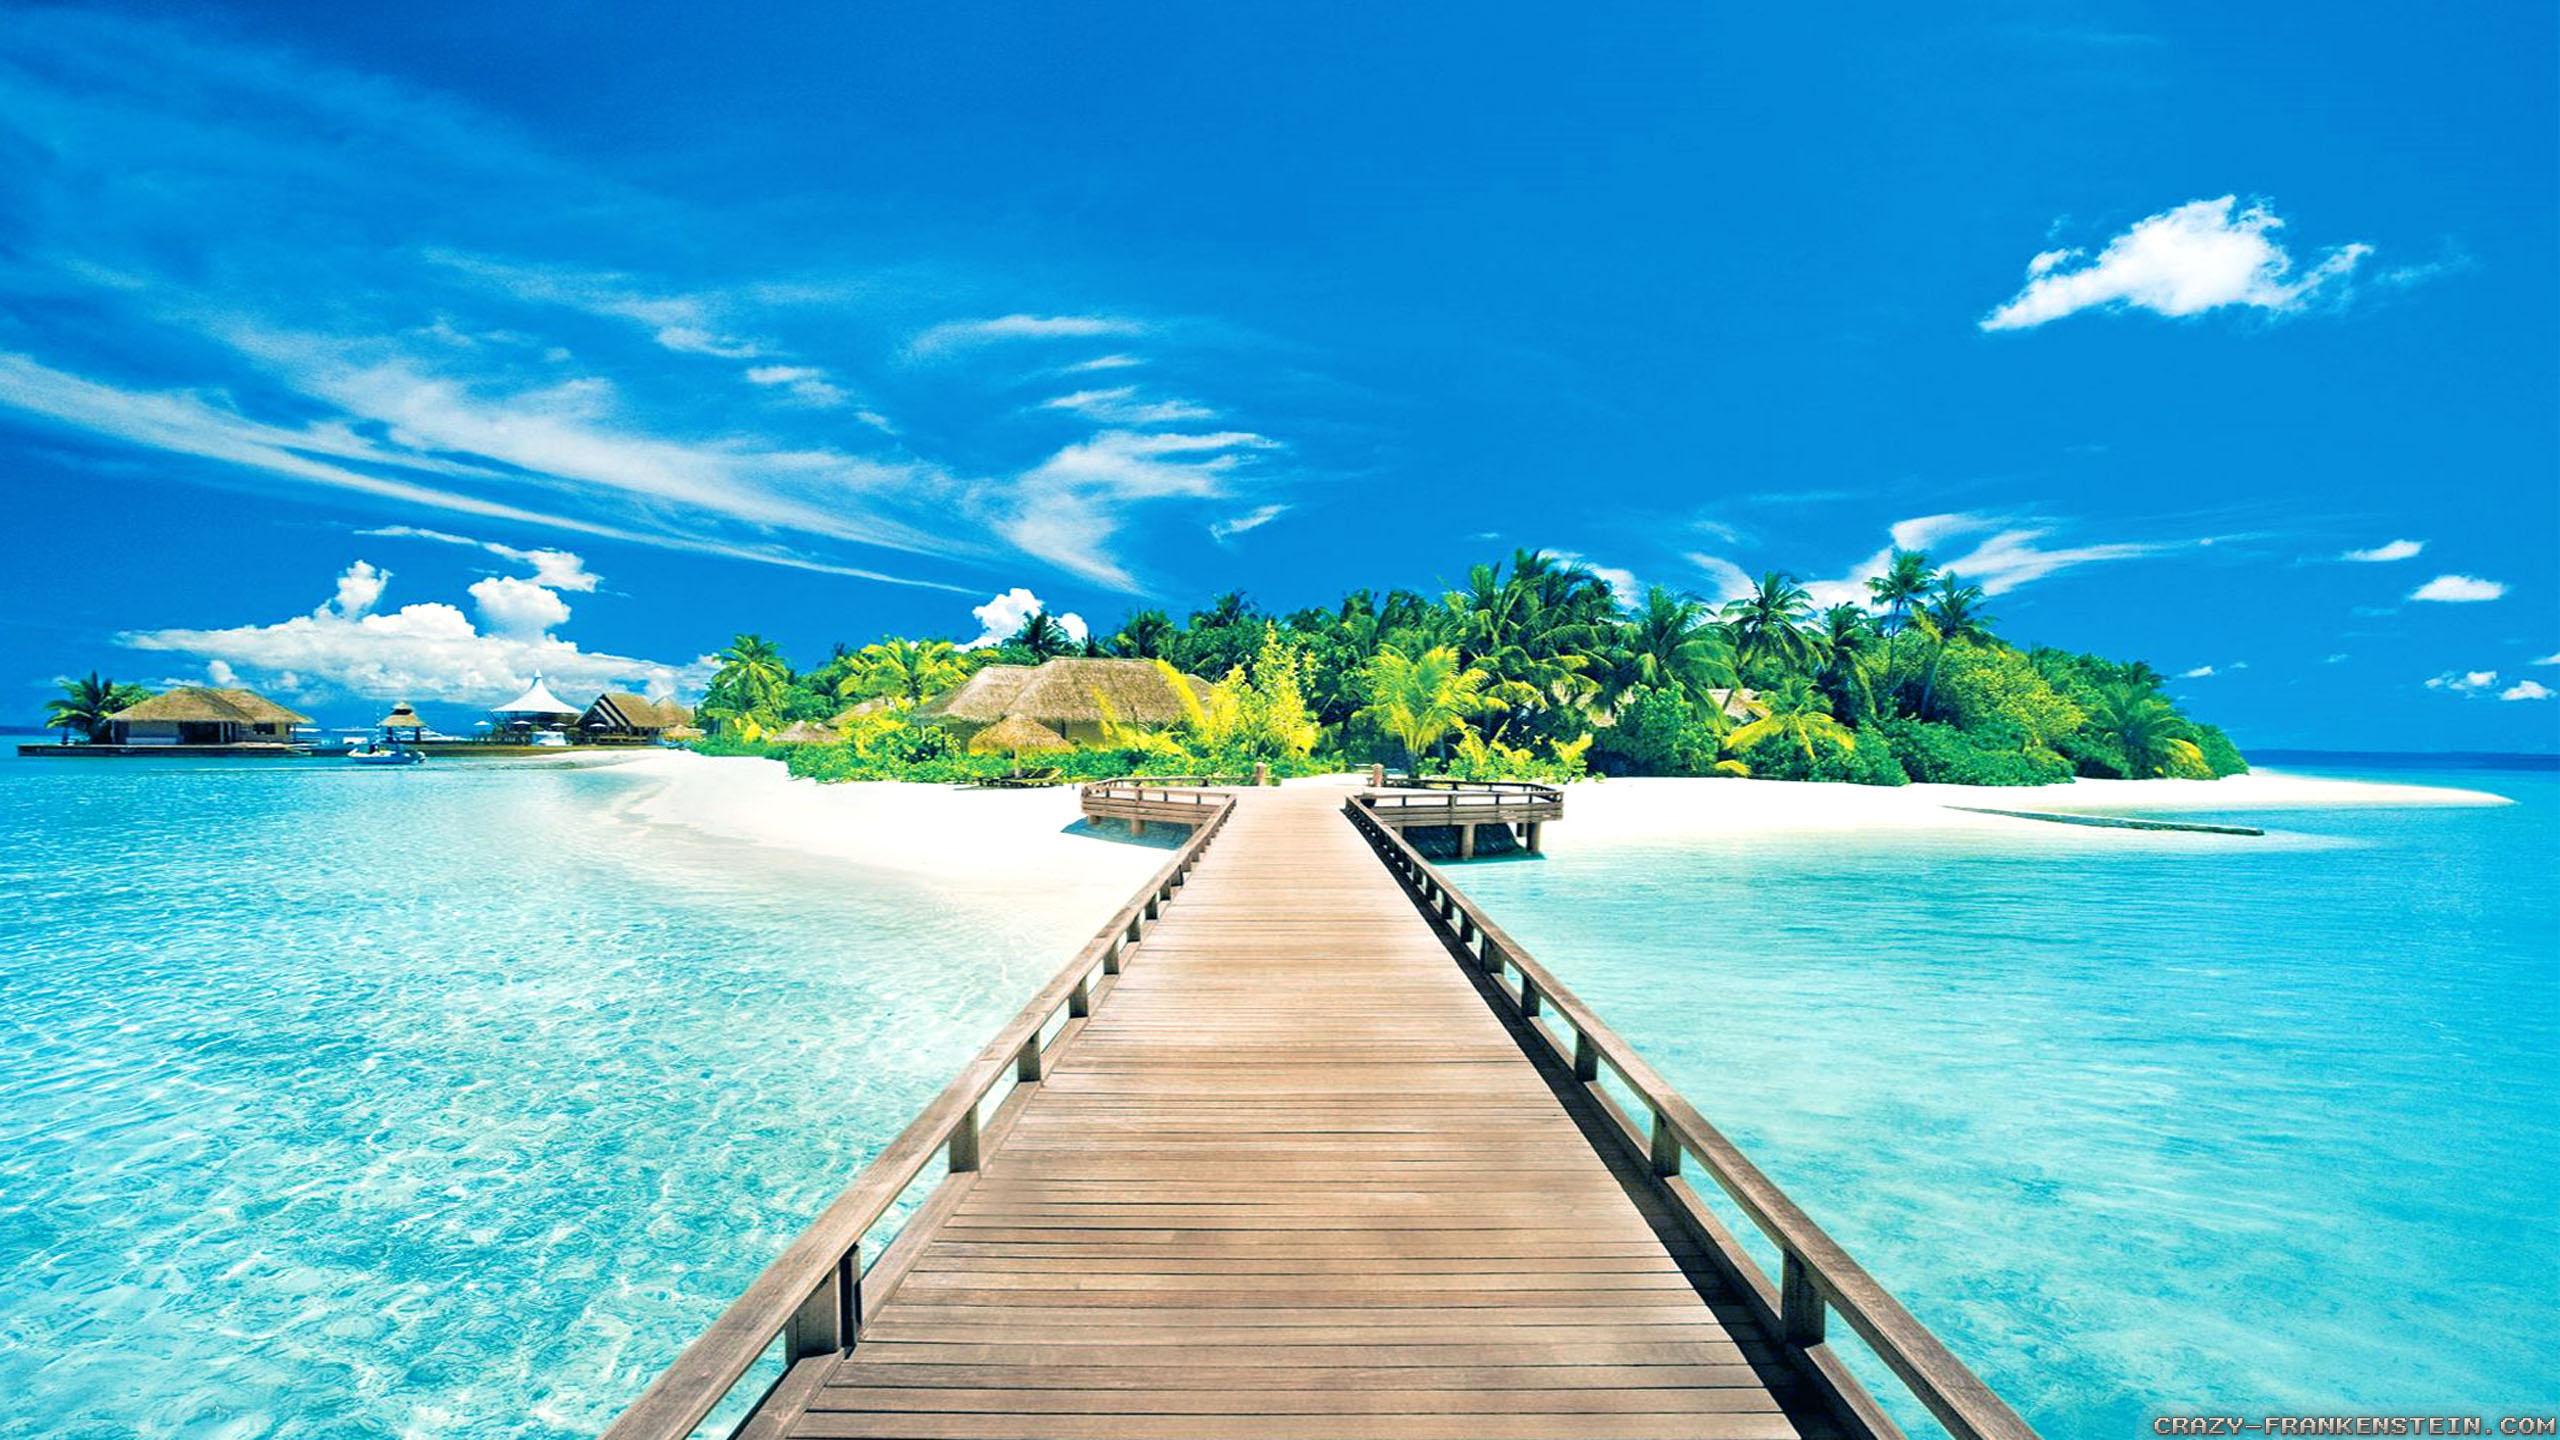 beautiful beach hd wallpapers 110 Freetopwallpapercom 2560x1440